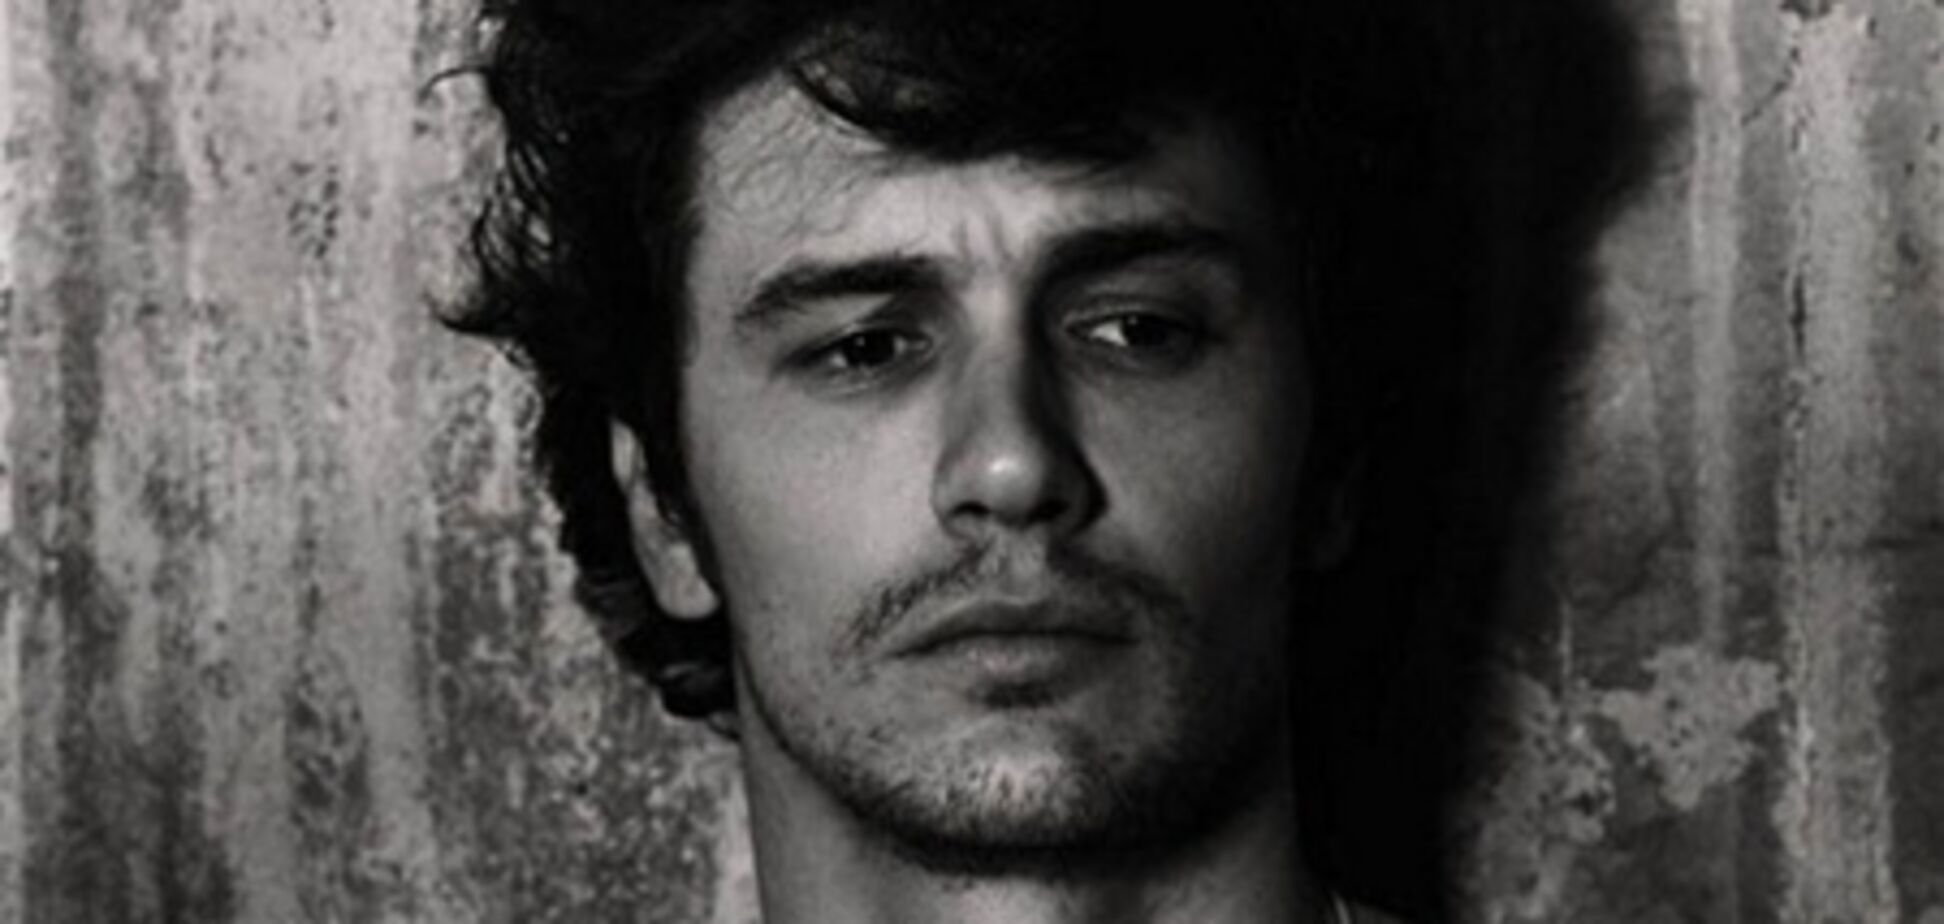 Джеймс Франко - хулиган